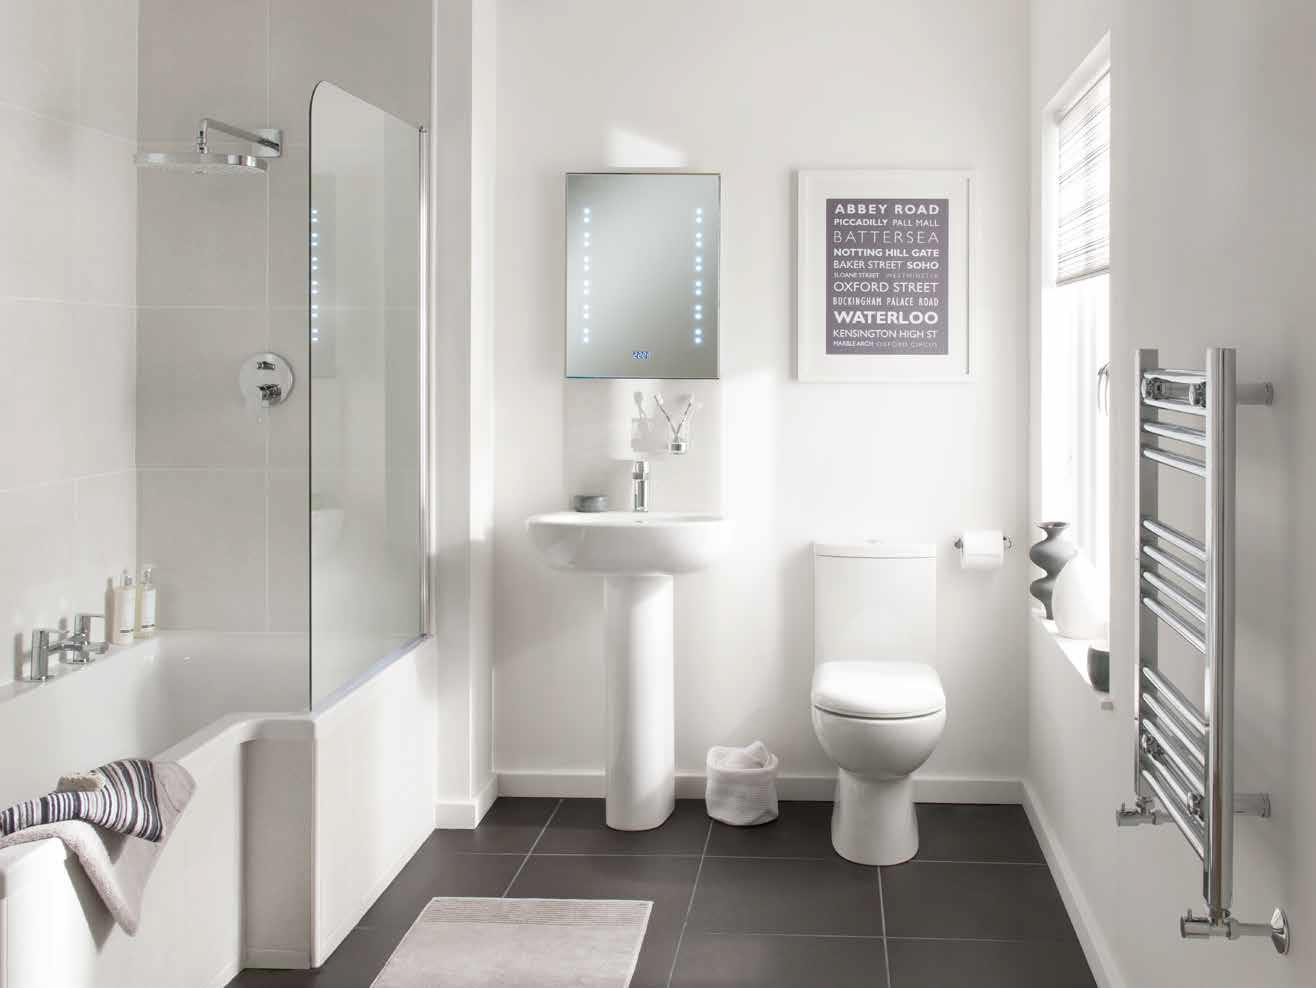 Metris single lever low pressure bath filler deck - Simple bathroom designs for small spaces ...